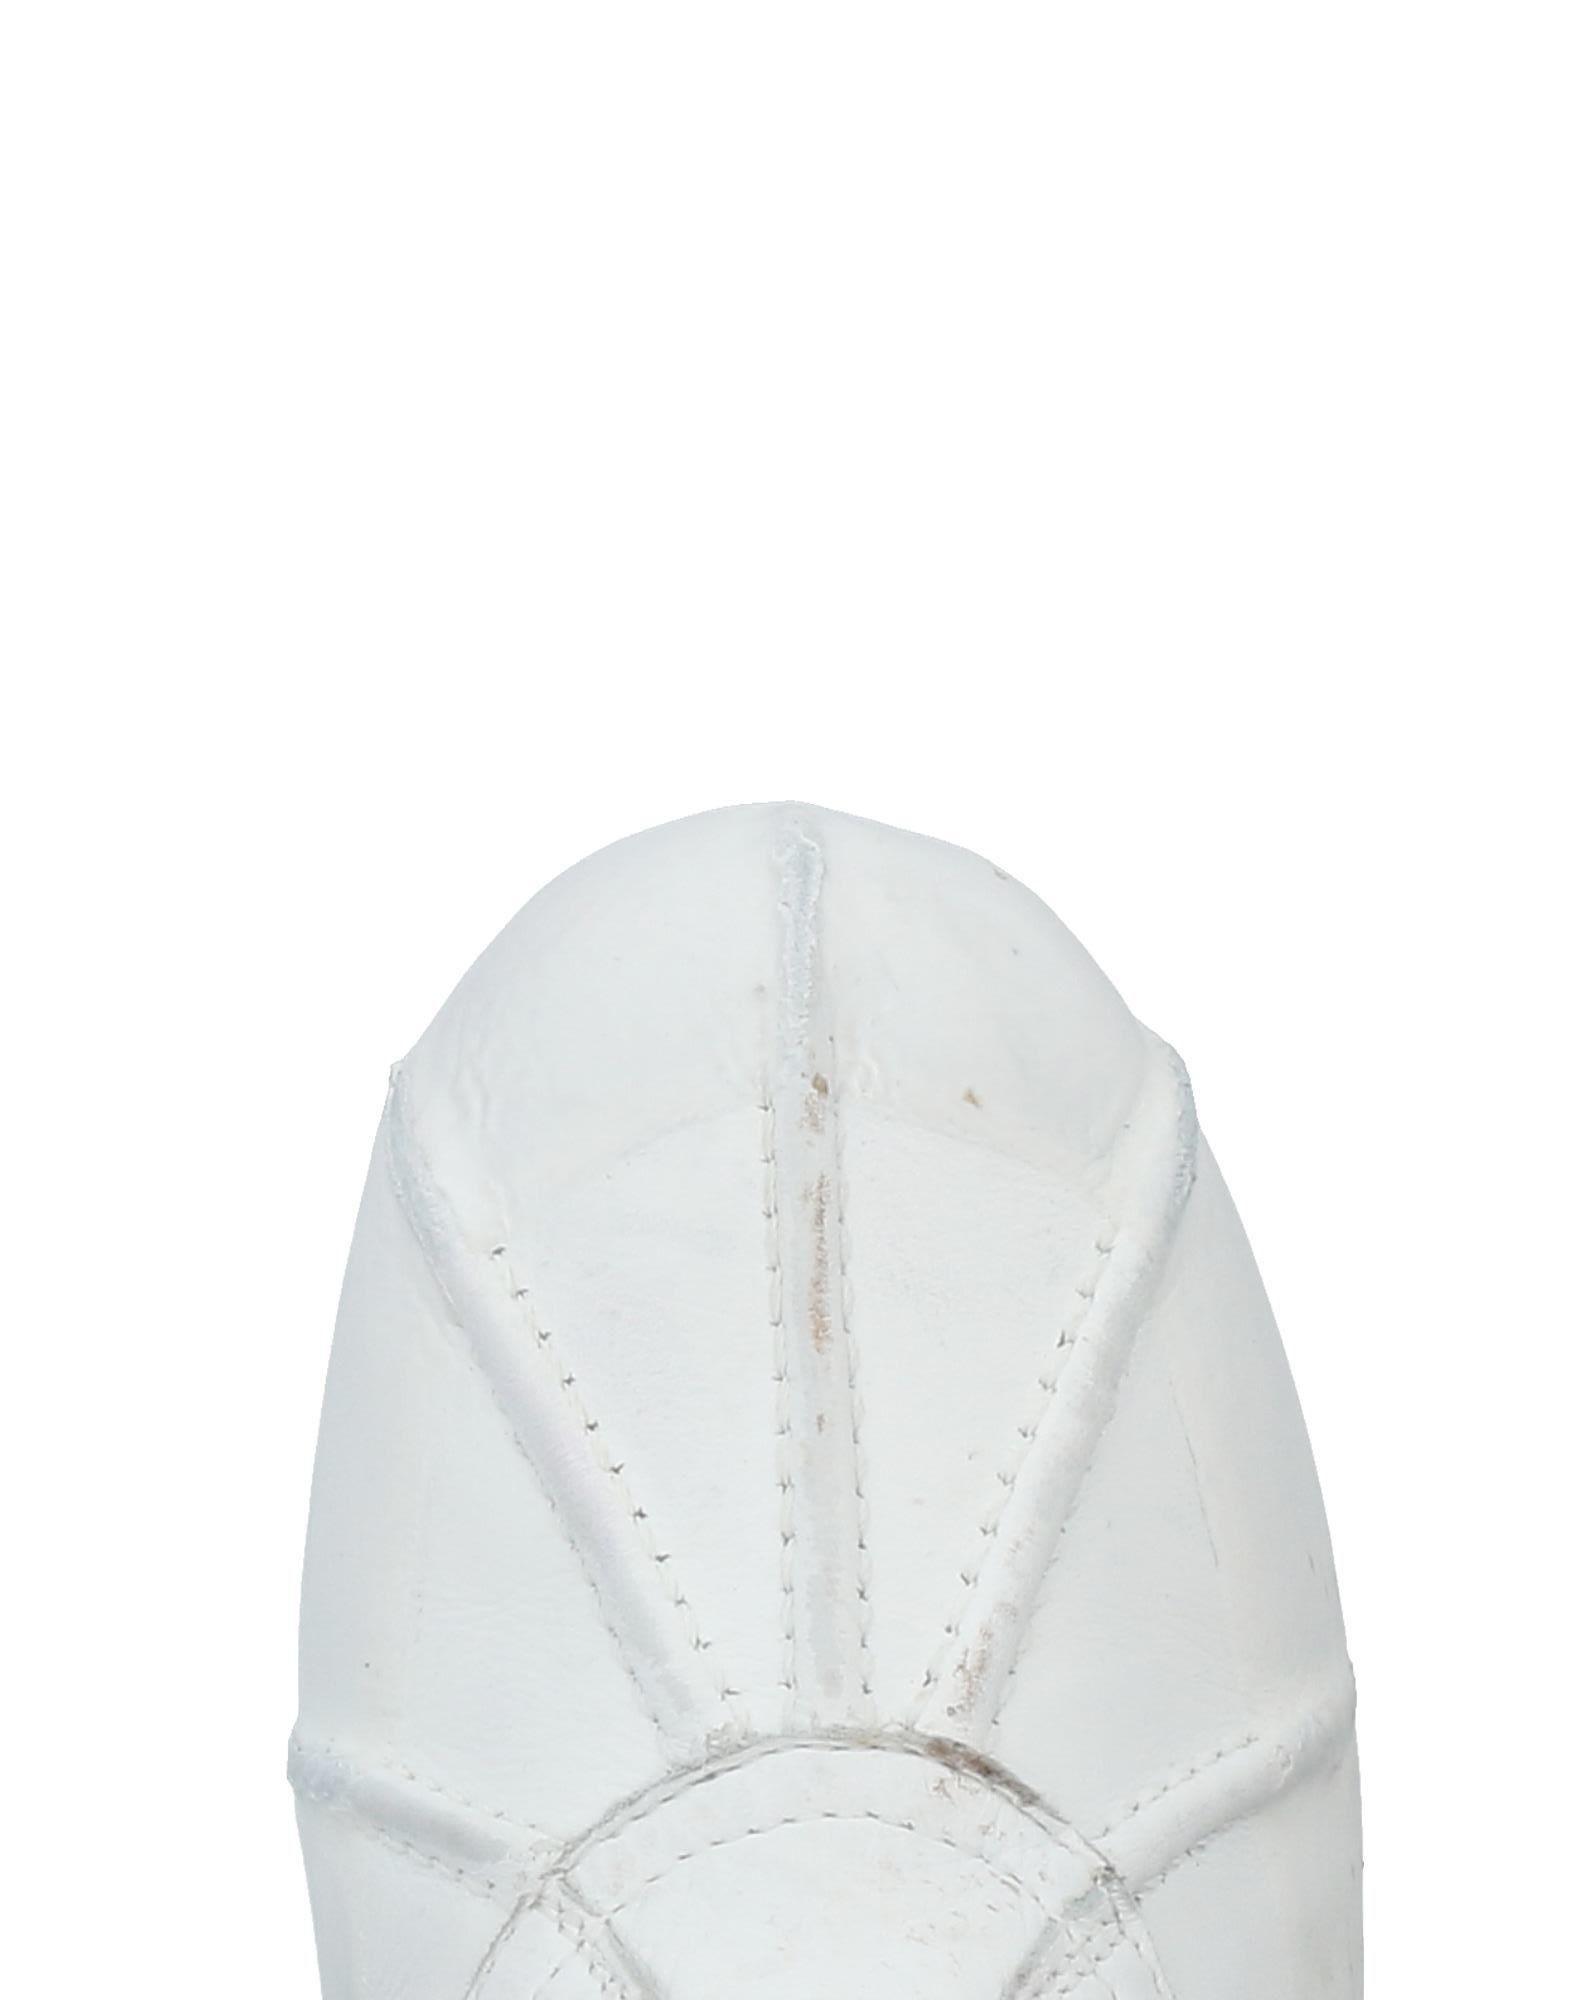 O.X.S. Rubber es Soul Sneakers Damen Gutes Preis-Leistungs-Verhältnis, es Rubber lohnt sich 4019 7cfa53